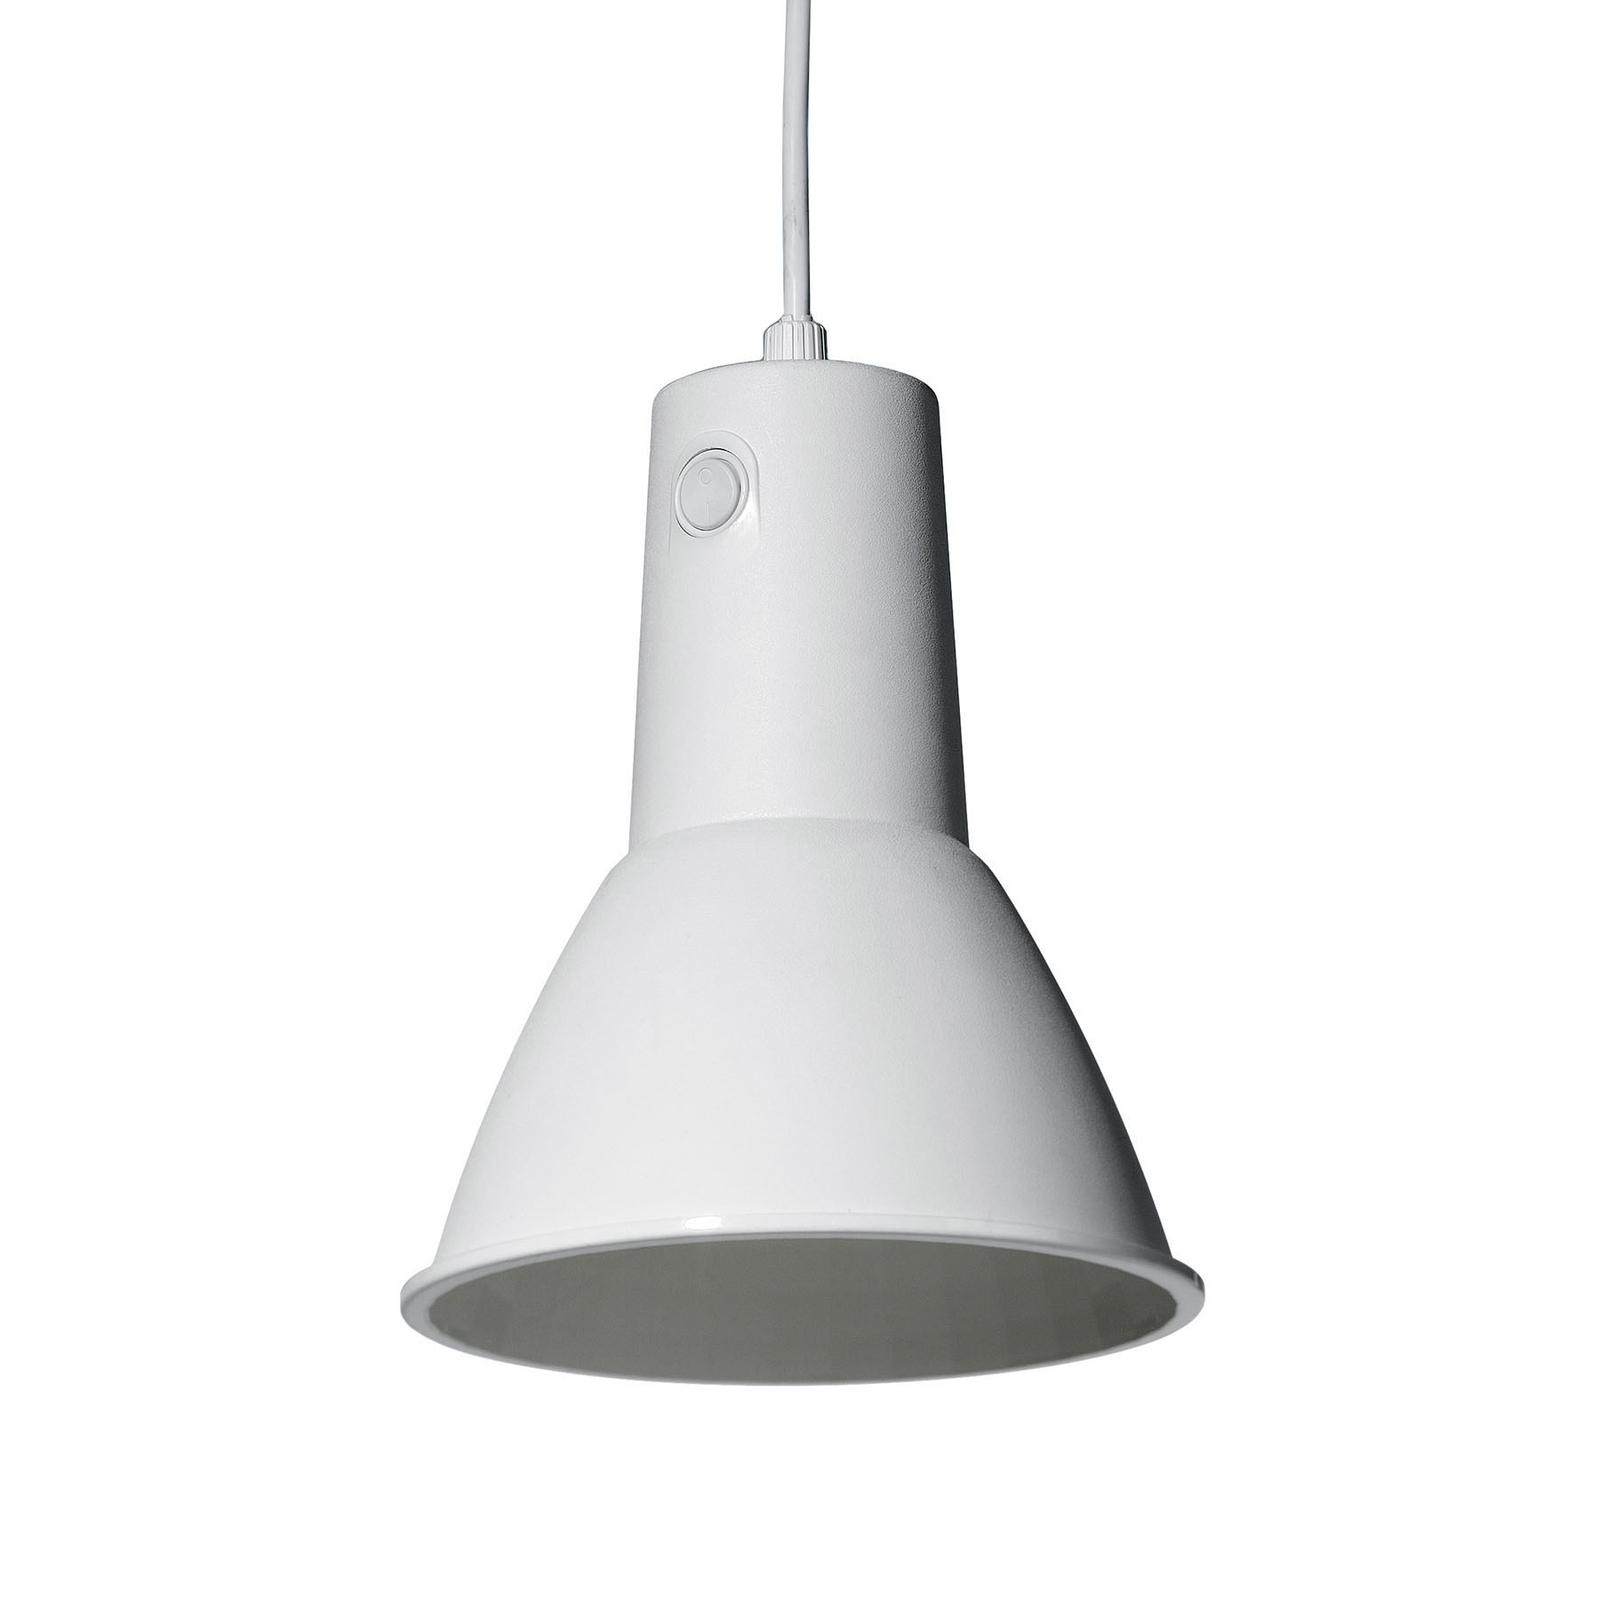 Megaman Plant Lamp pendelset inklusive E27 ESL 14W